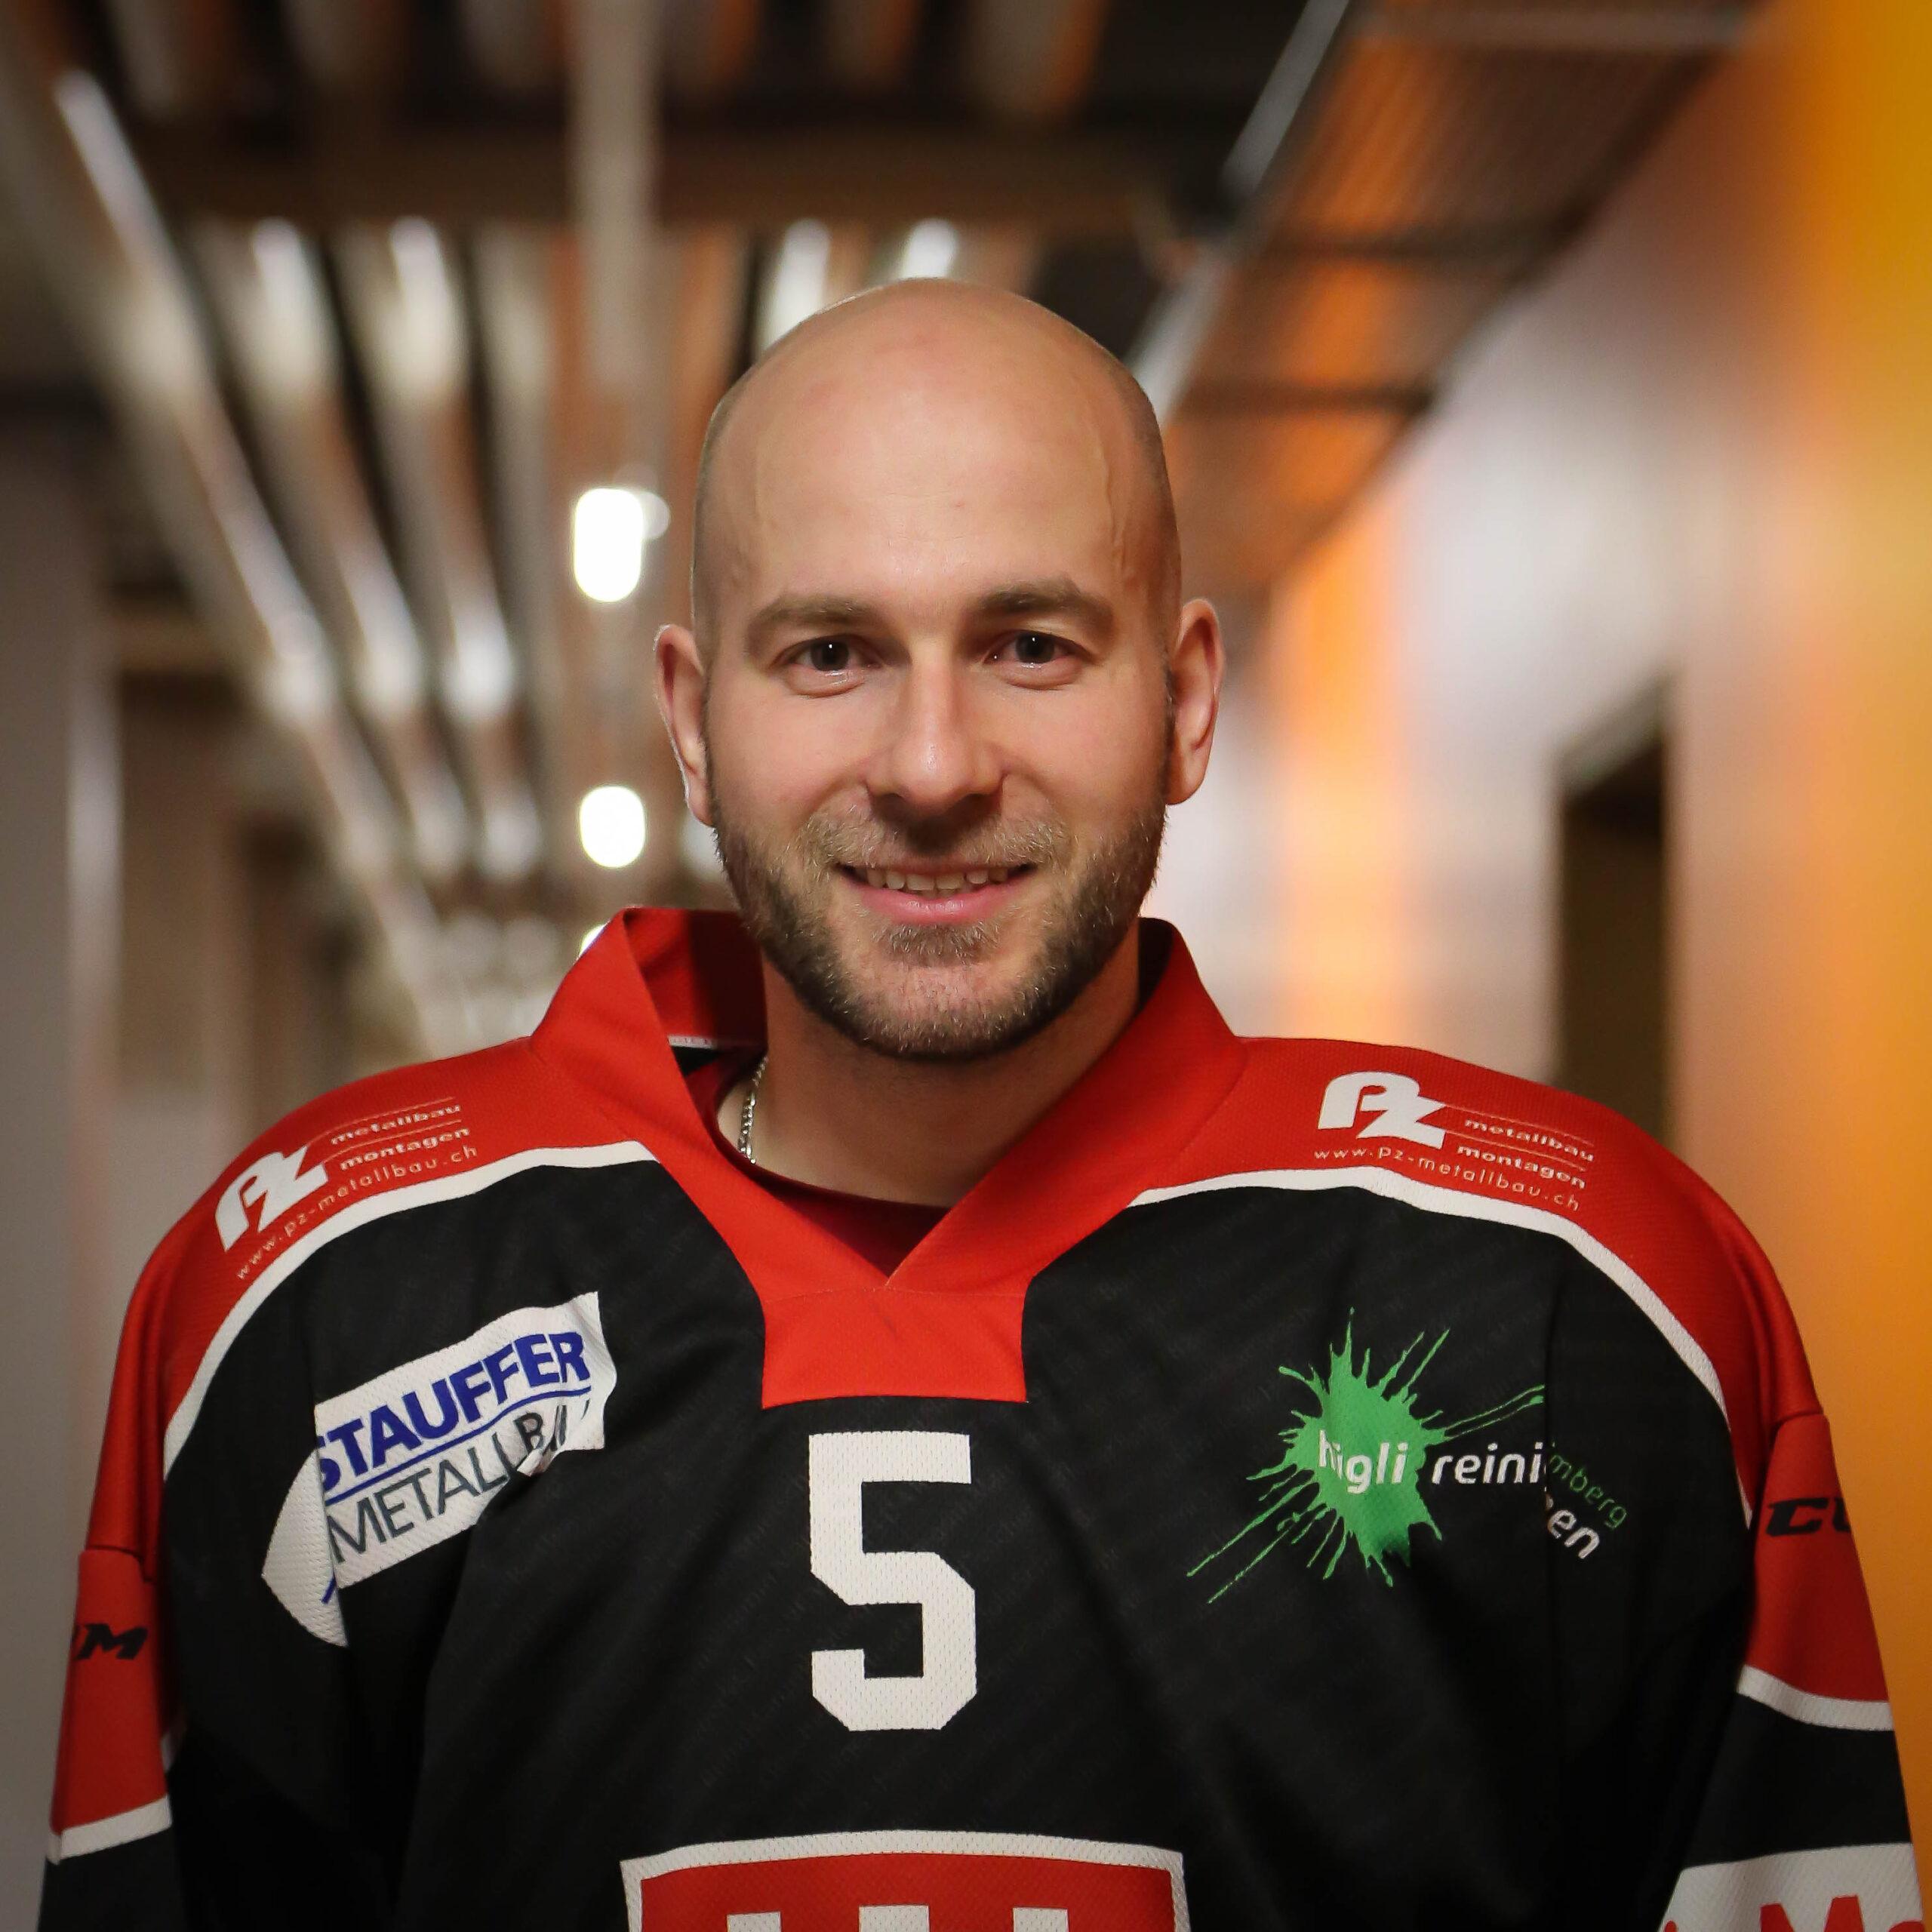 Michel Reber